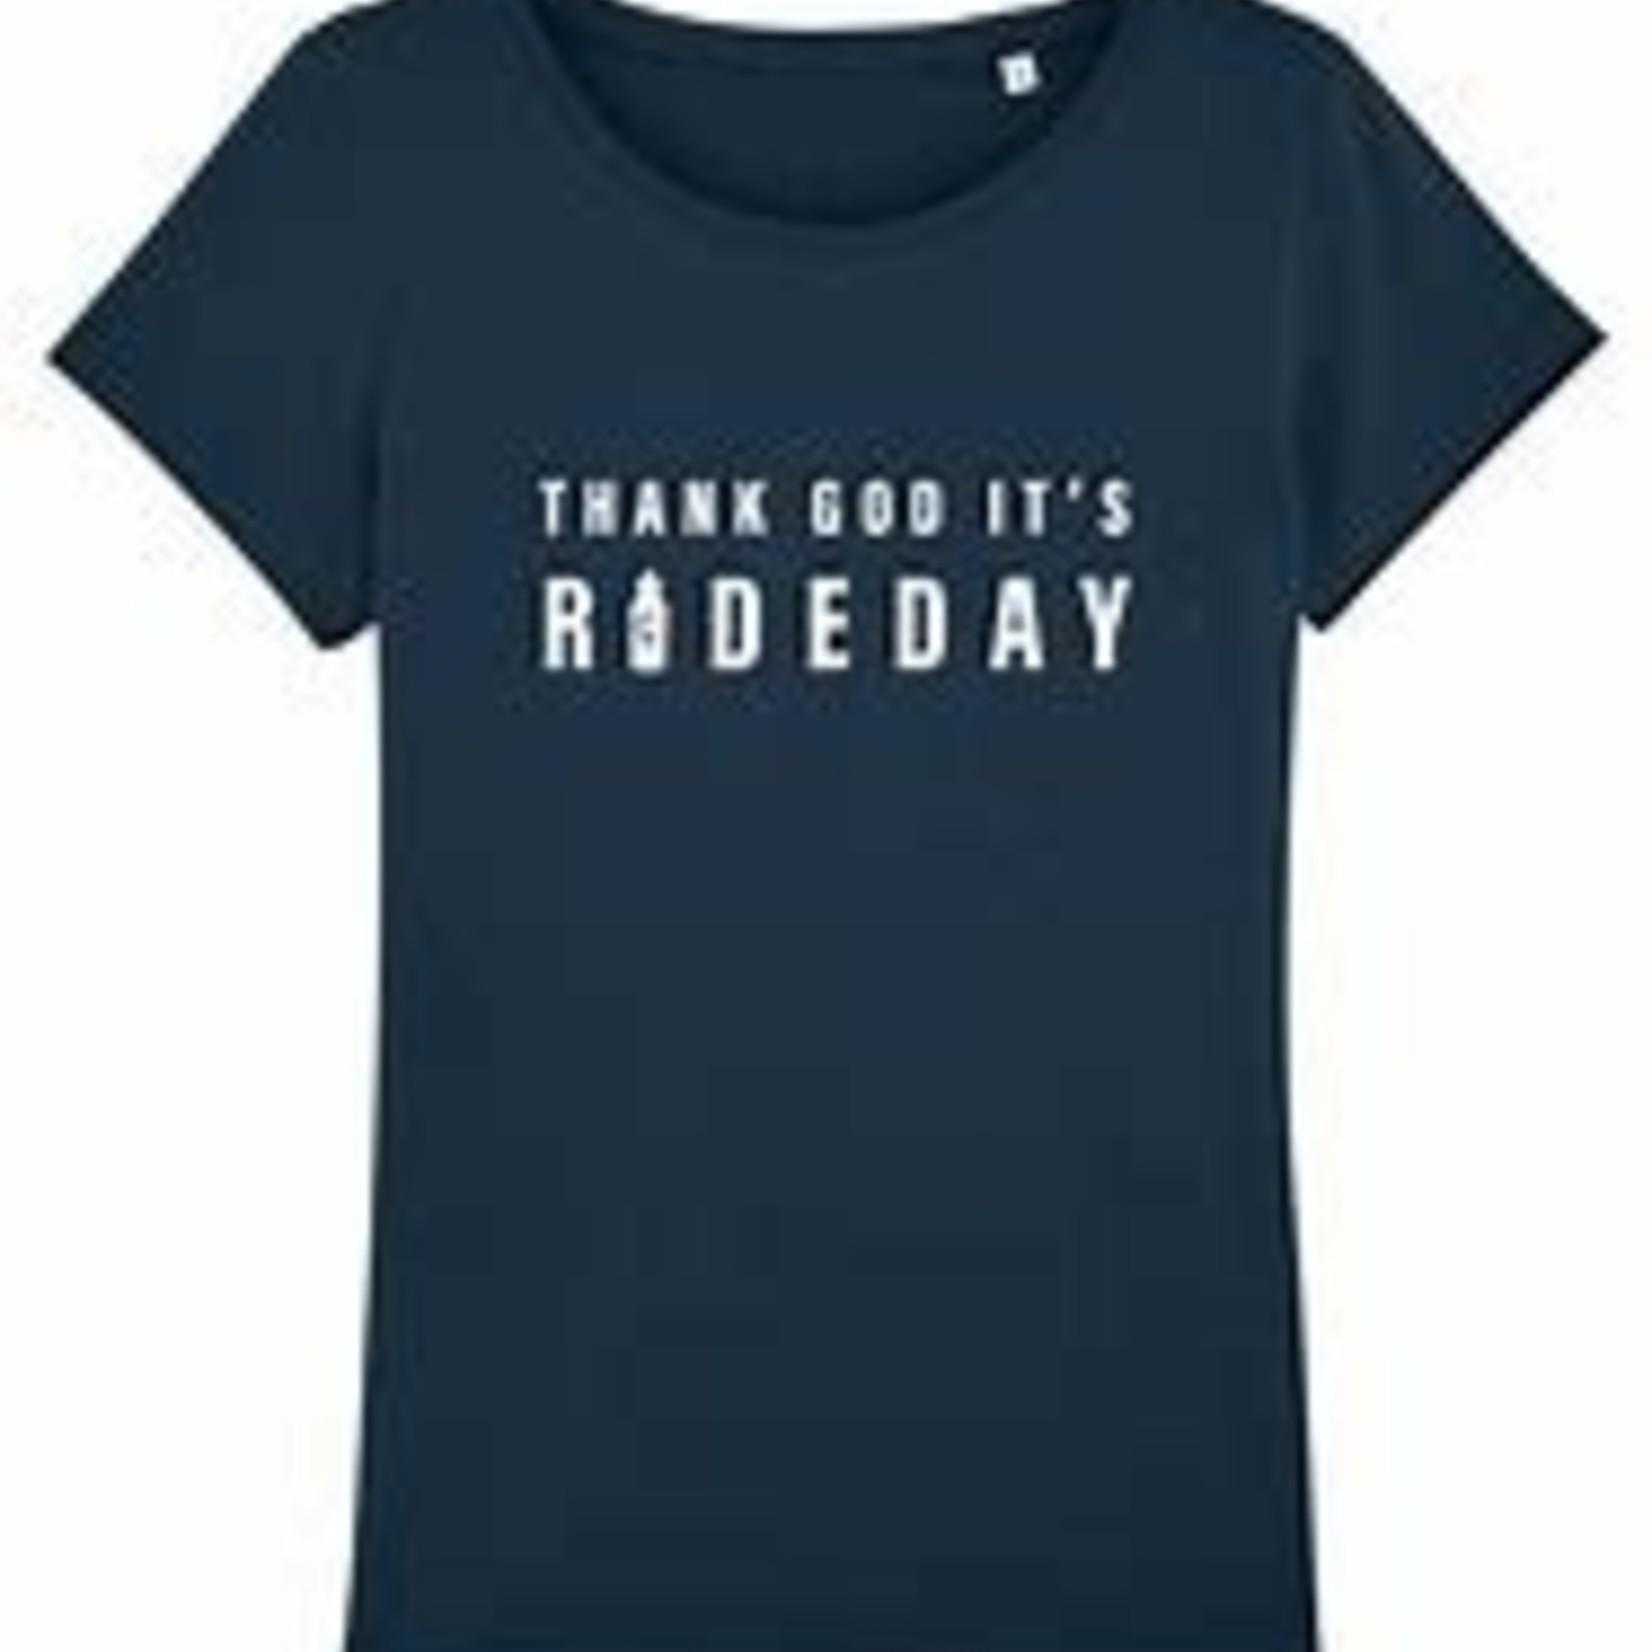 T-shirt 'Thank God it's rideday' female